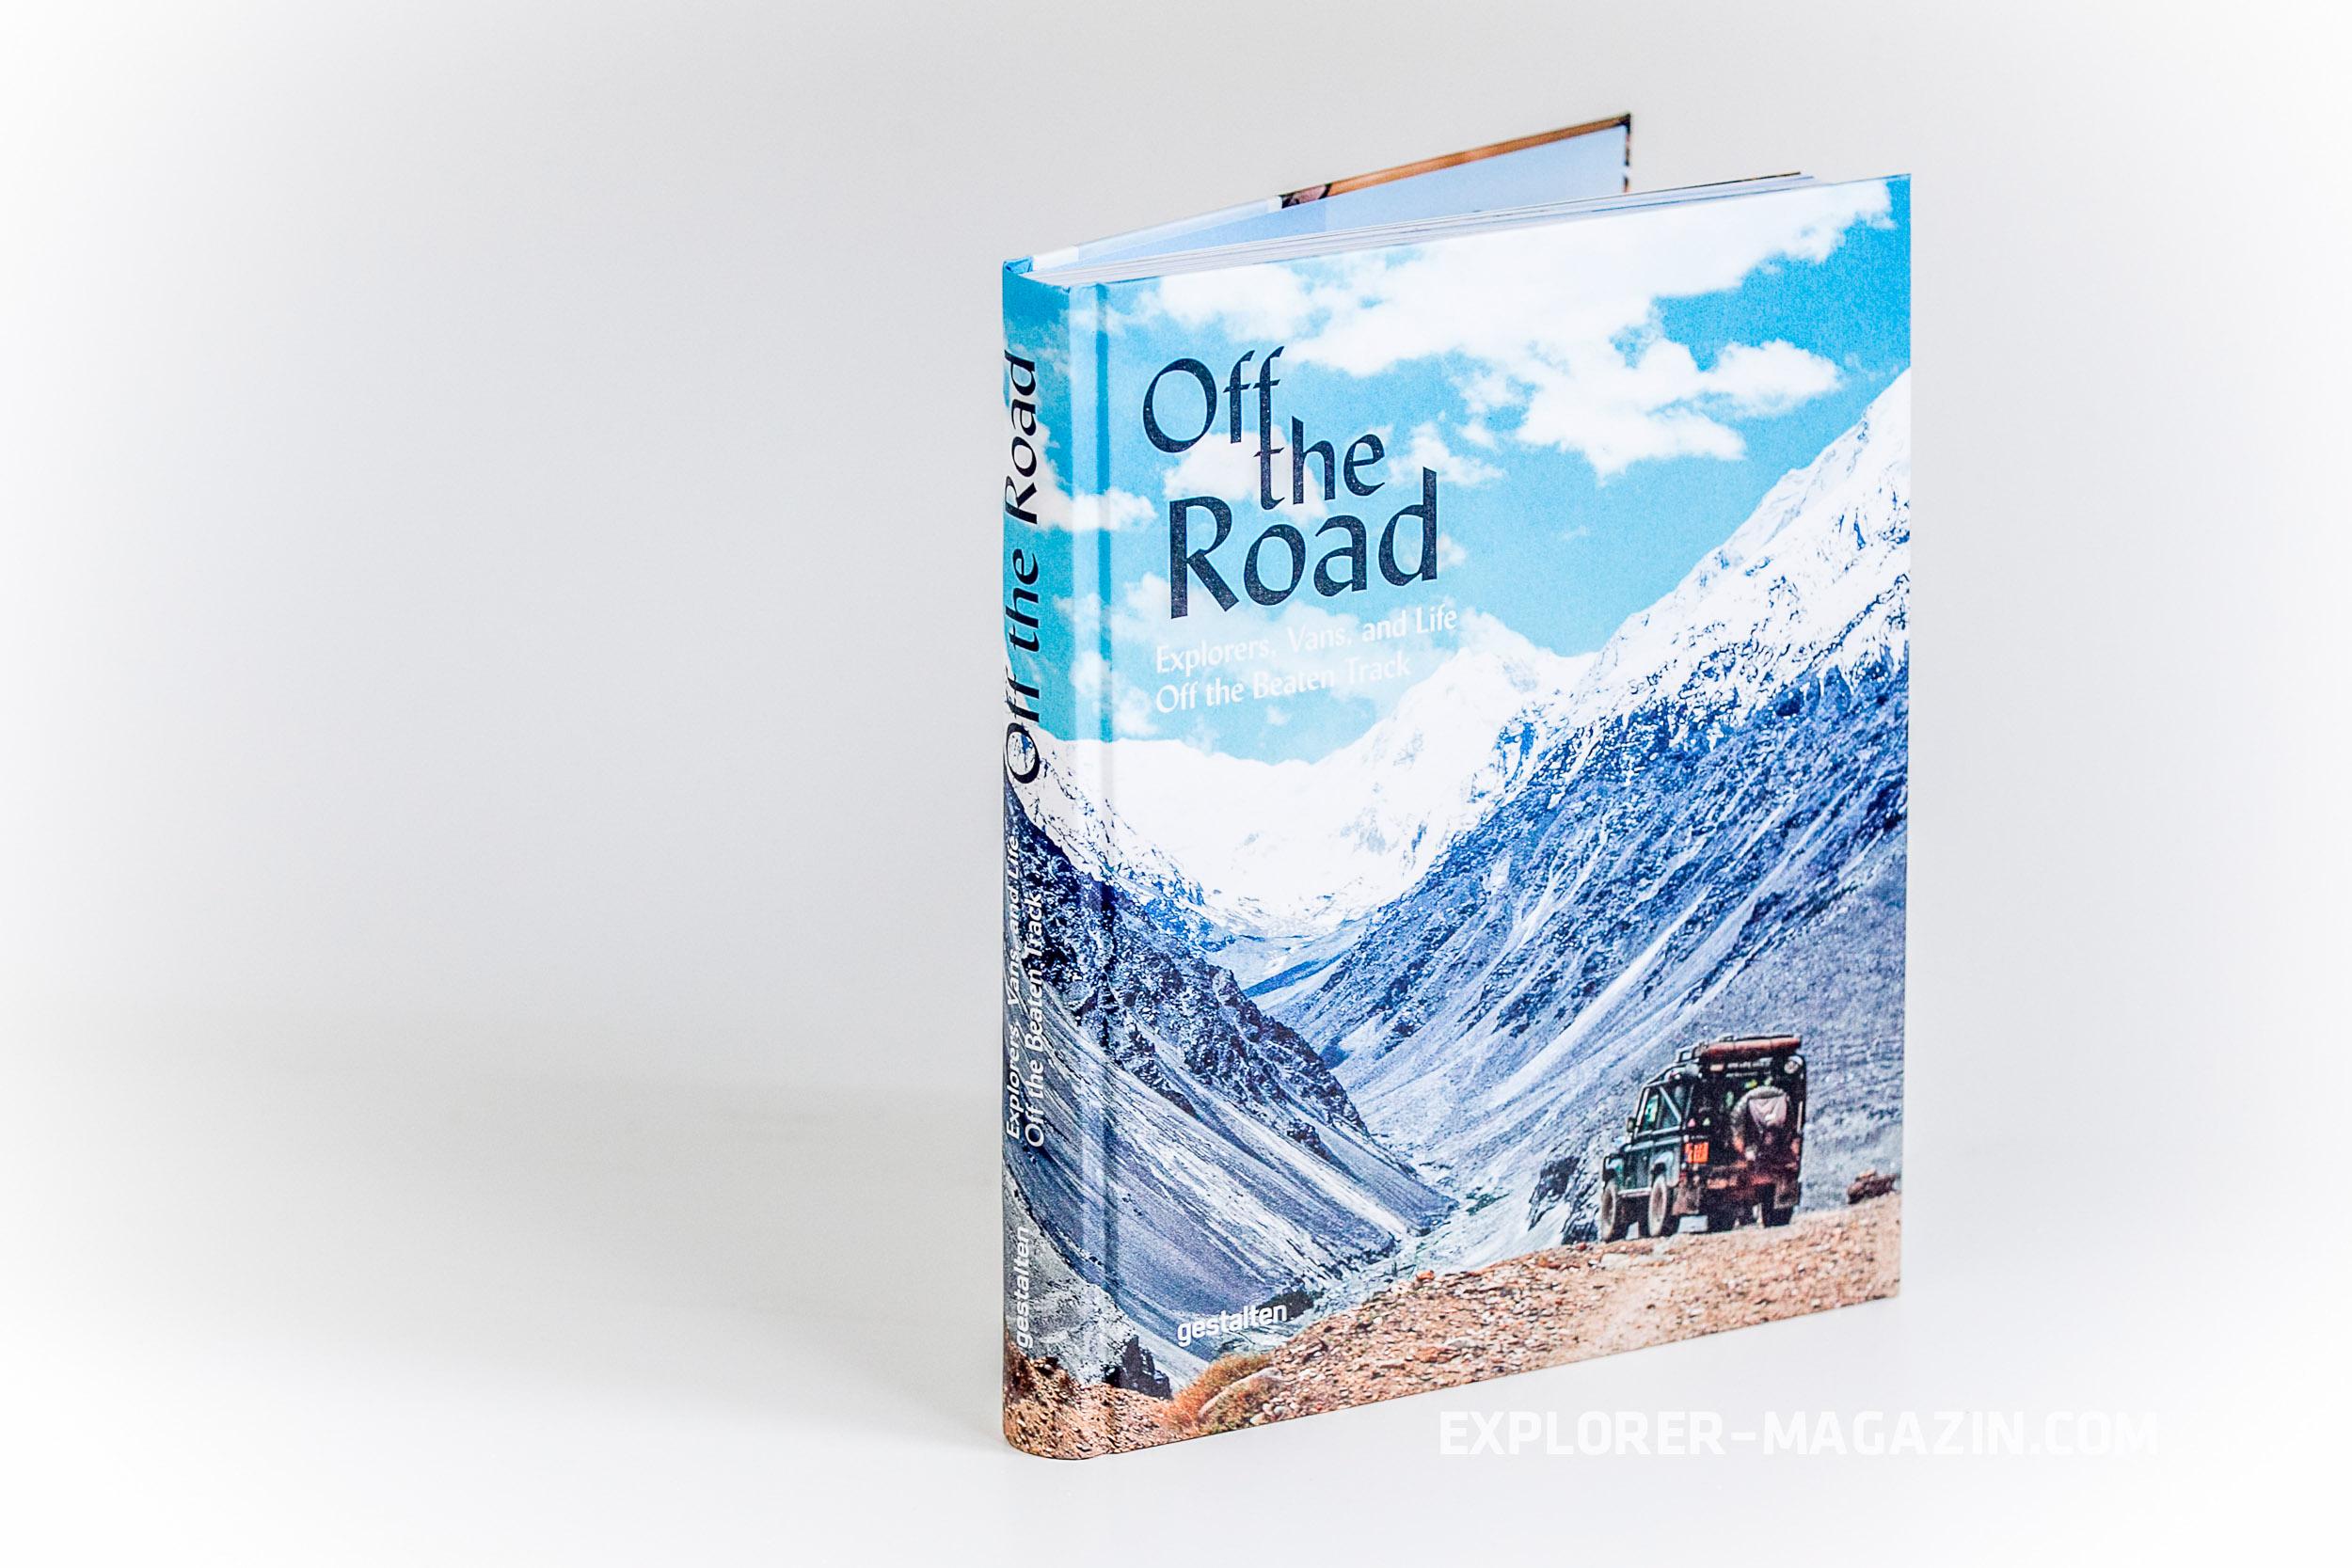 Off the Road Bildband Gestalten Verlag